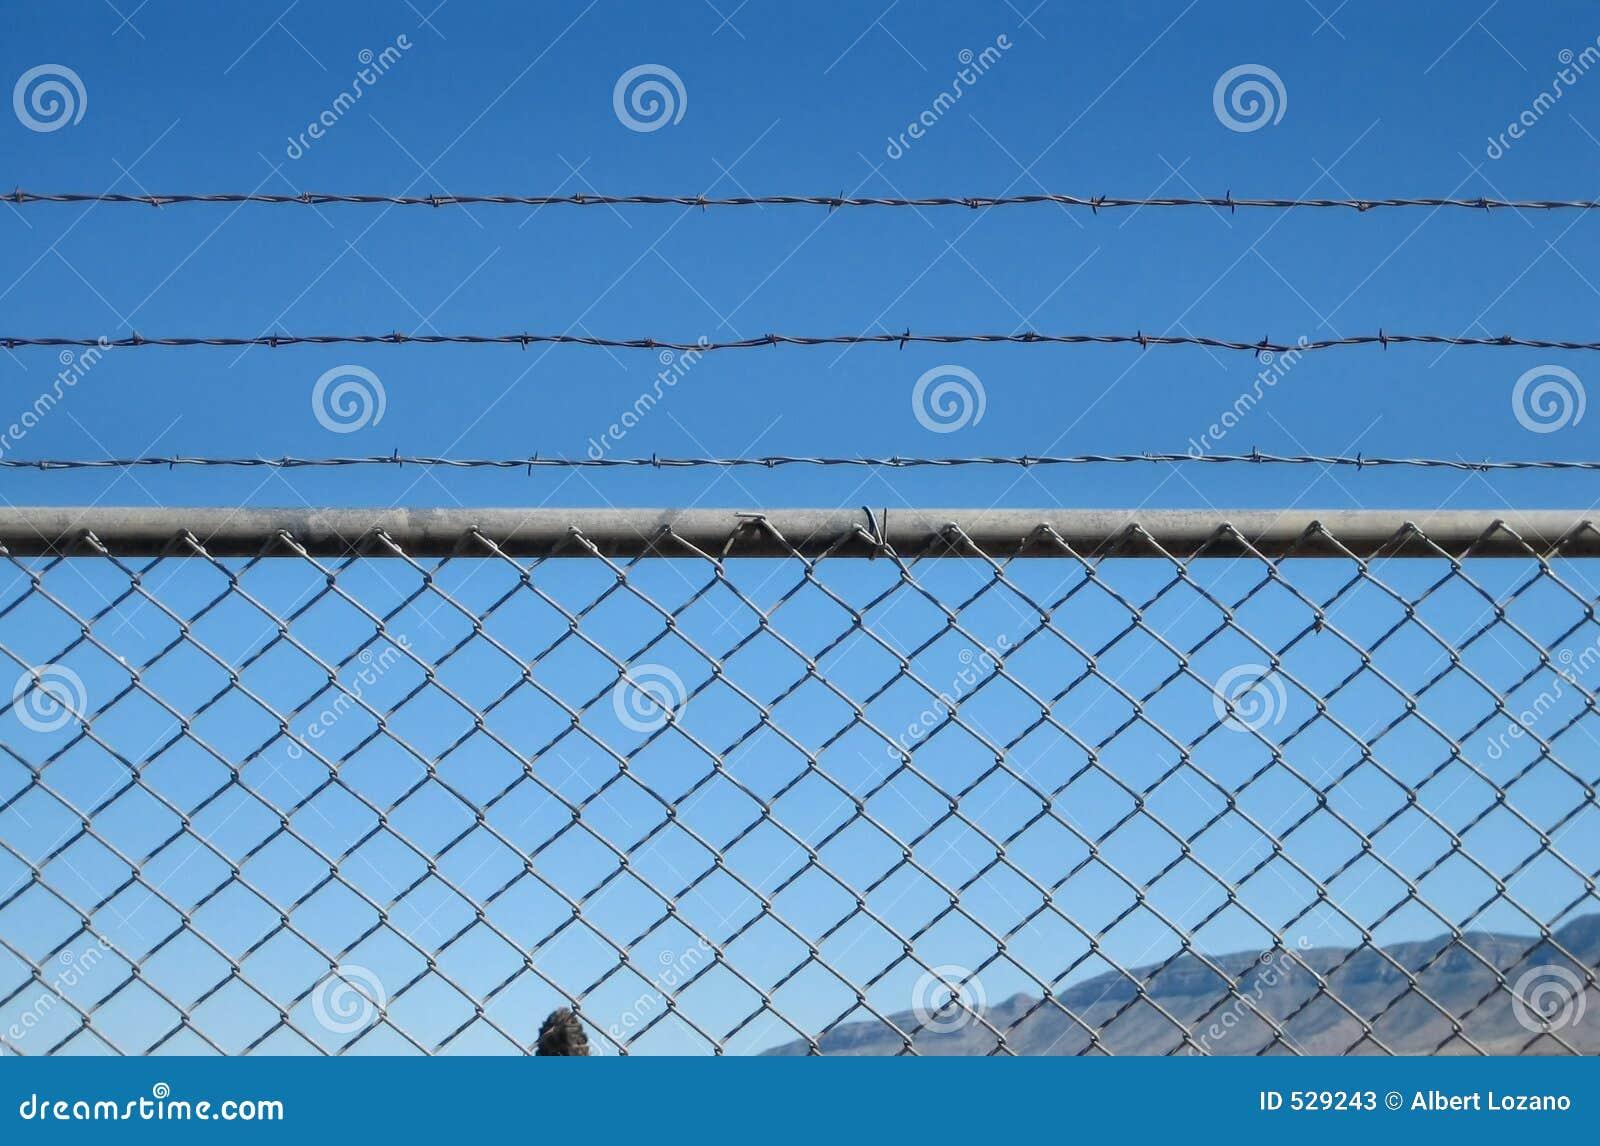 Download 监狱 库存图片. 图片 包括有 全能, 花格, 范围, 监狱, 处罚, 分娩, 囚犯, 分隔, 孤零零, 减胖法 - 529243